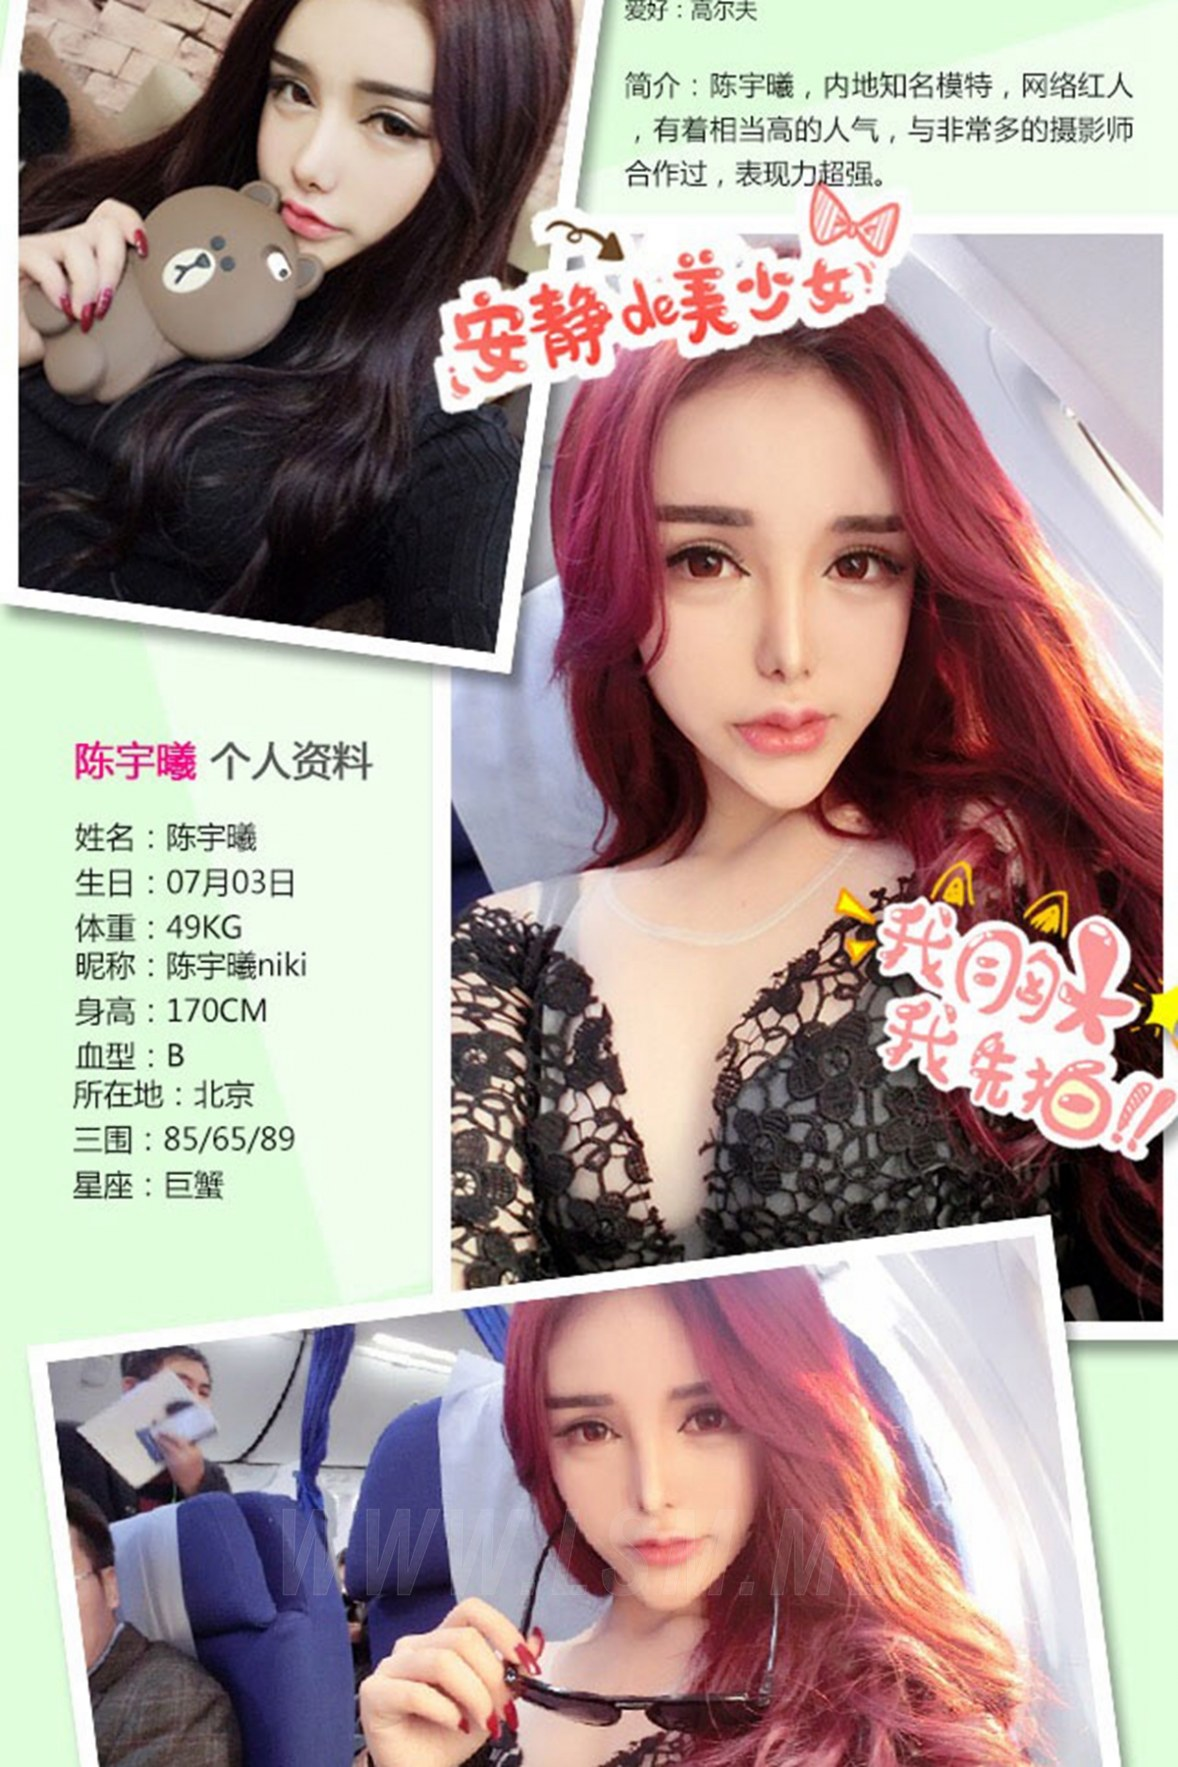 UGirls 爱尤物 No.389 Modo 陈宇曦 - 1